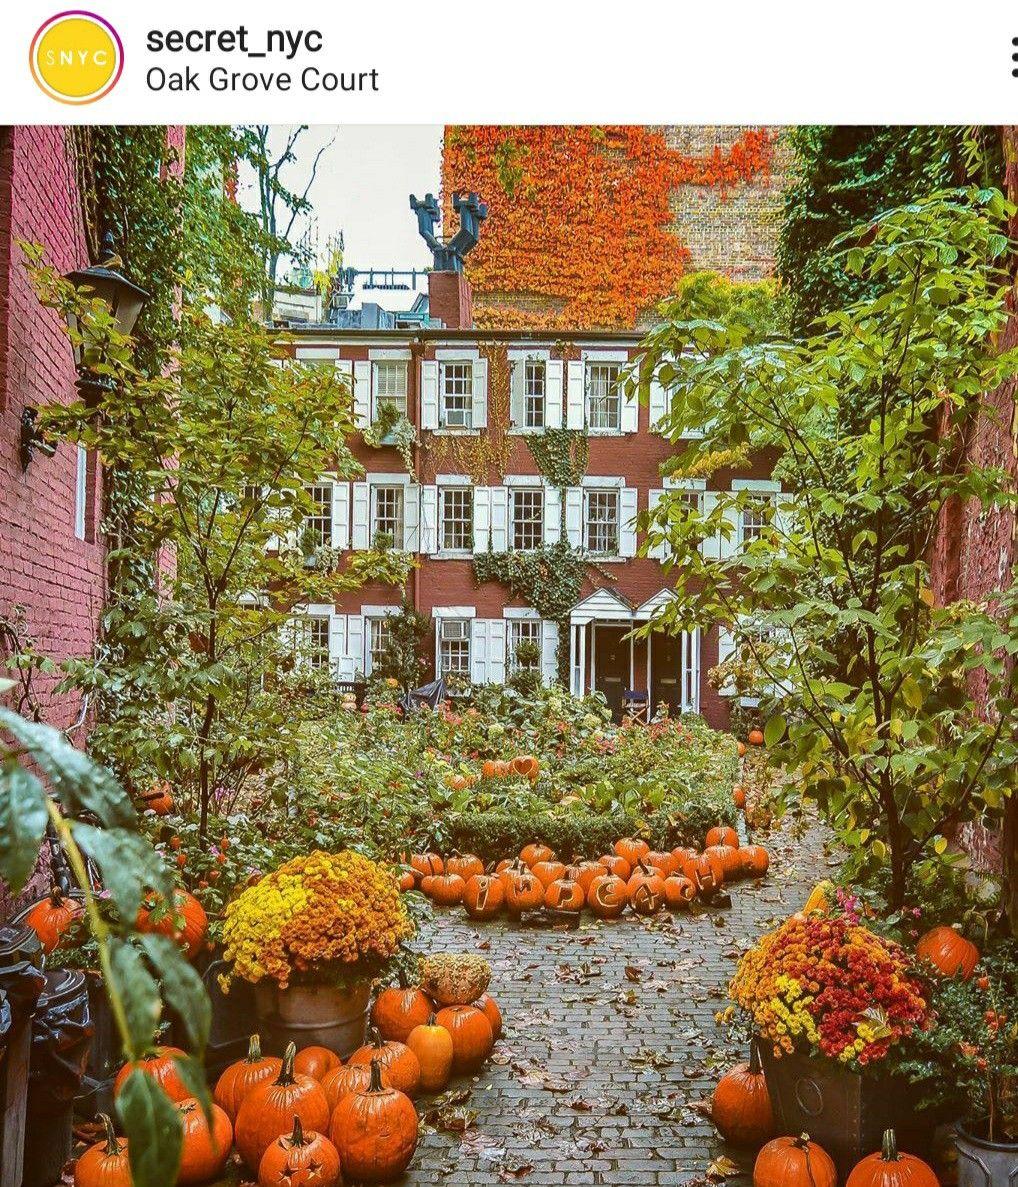 Pin By Deborah Basile Haskamp On I 3 Ny In 2020 Pumpkin Patch Pumpkin Oak Grove